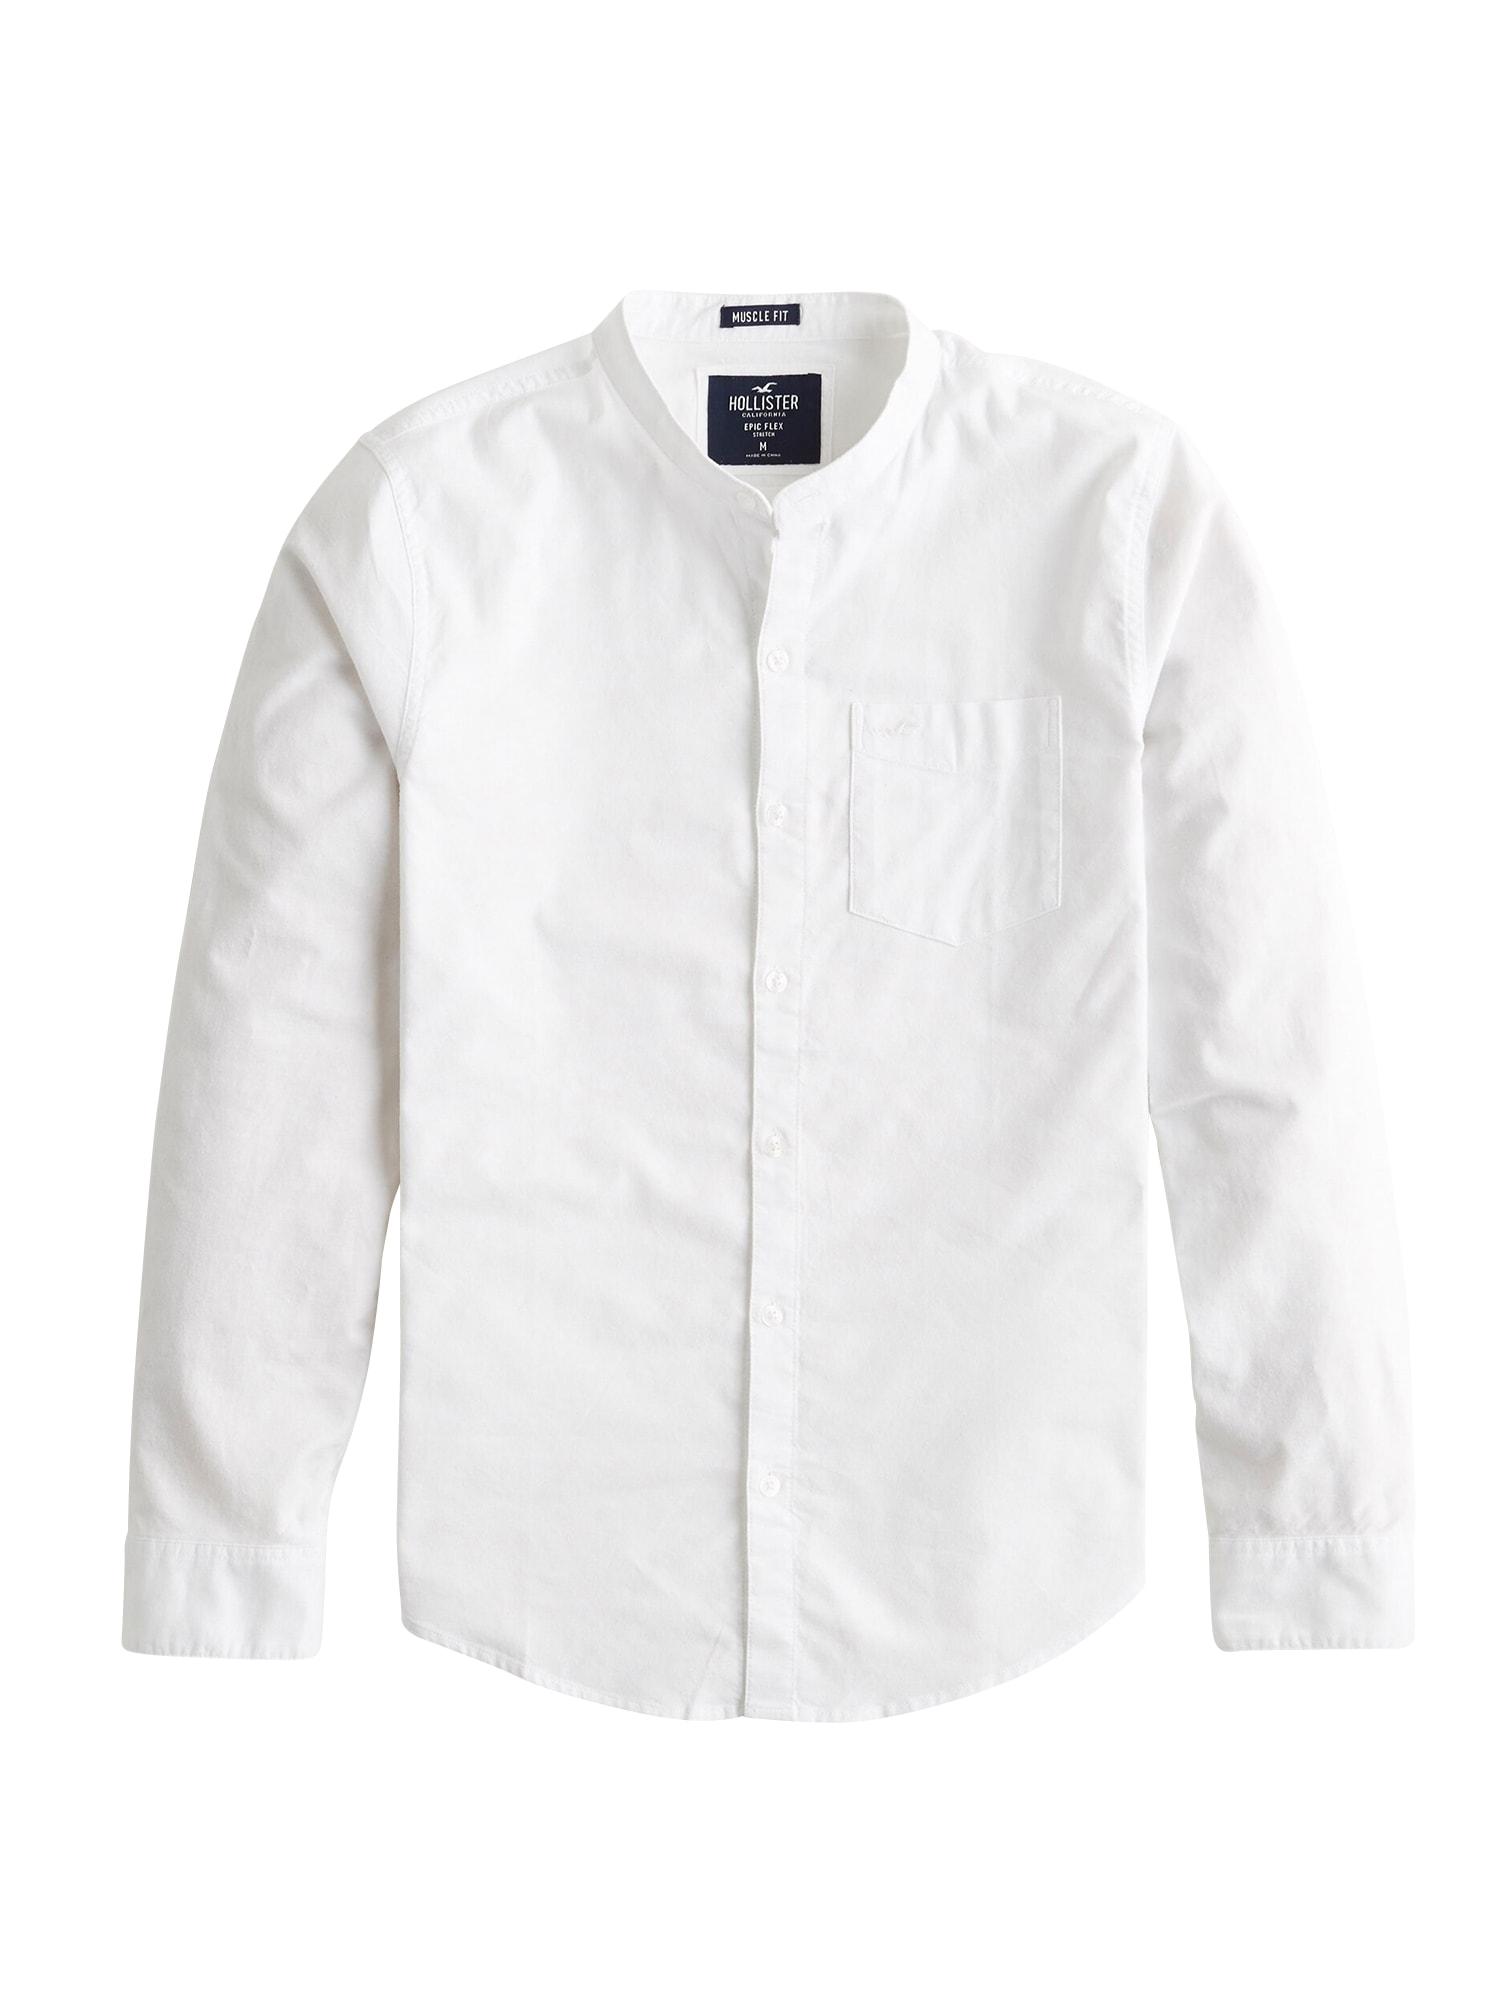 Společenská košile BTS19-LS MFIT BAND OX SLUB RO A2 3CC bílá HOLLISTER